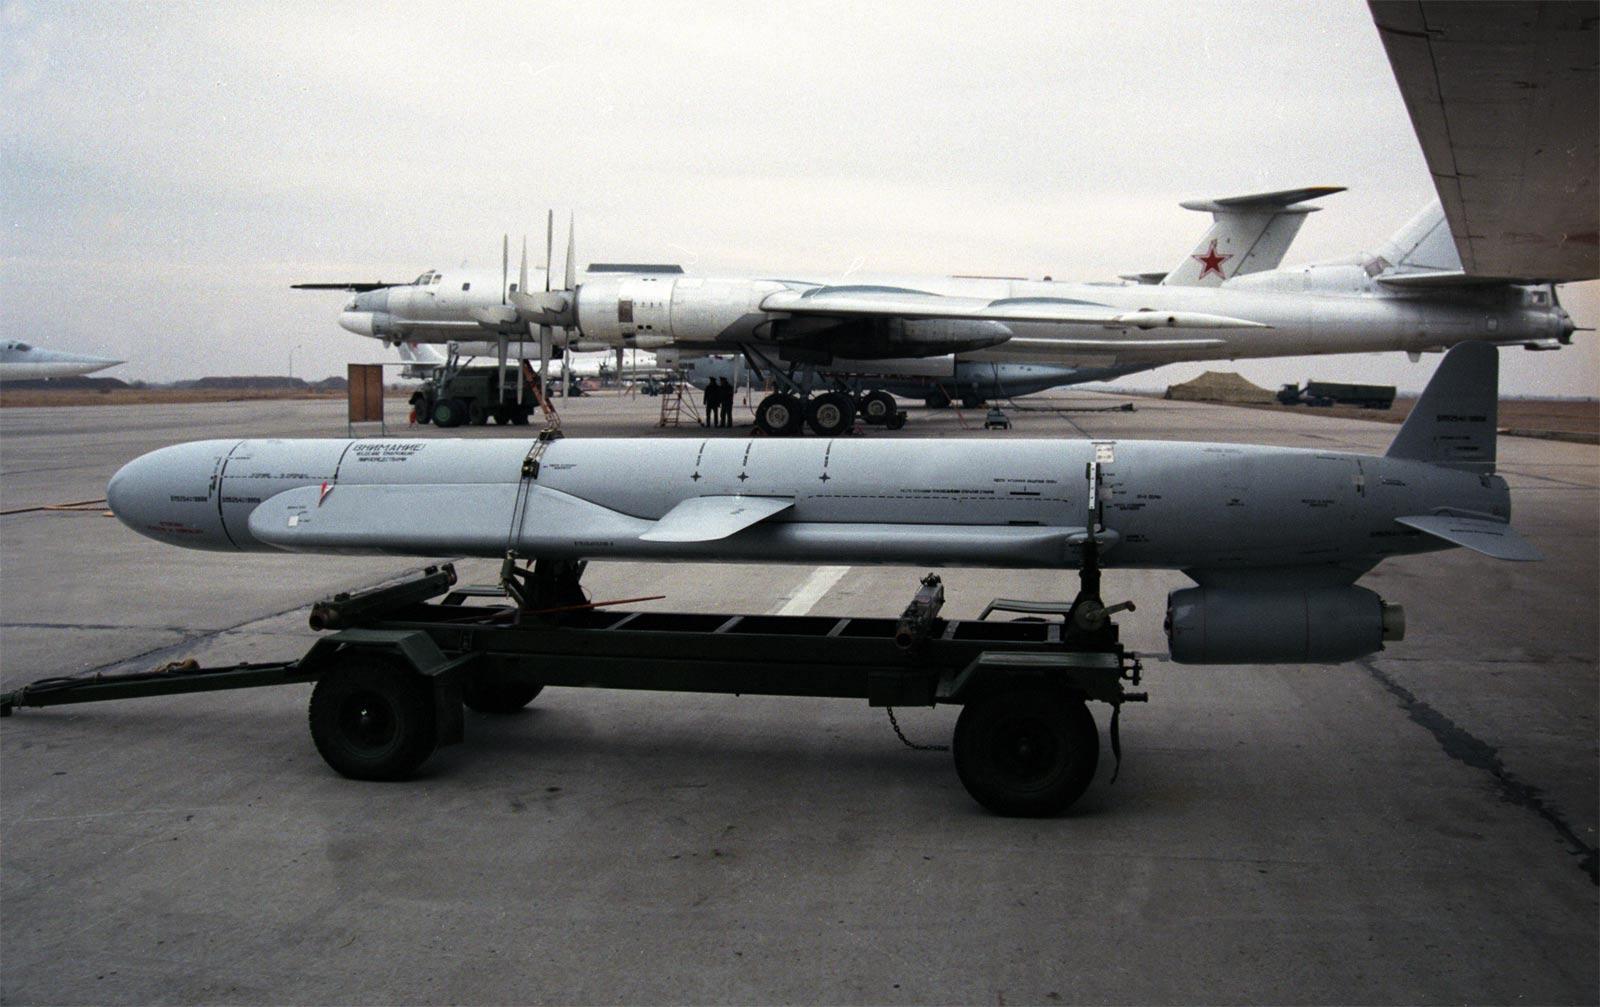 http://militaryrussia.ru/i/284/702/ejF1S.jpg